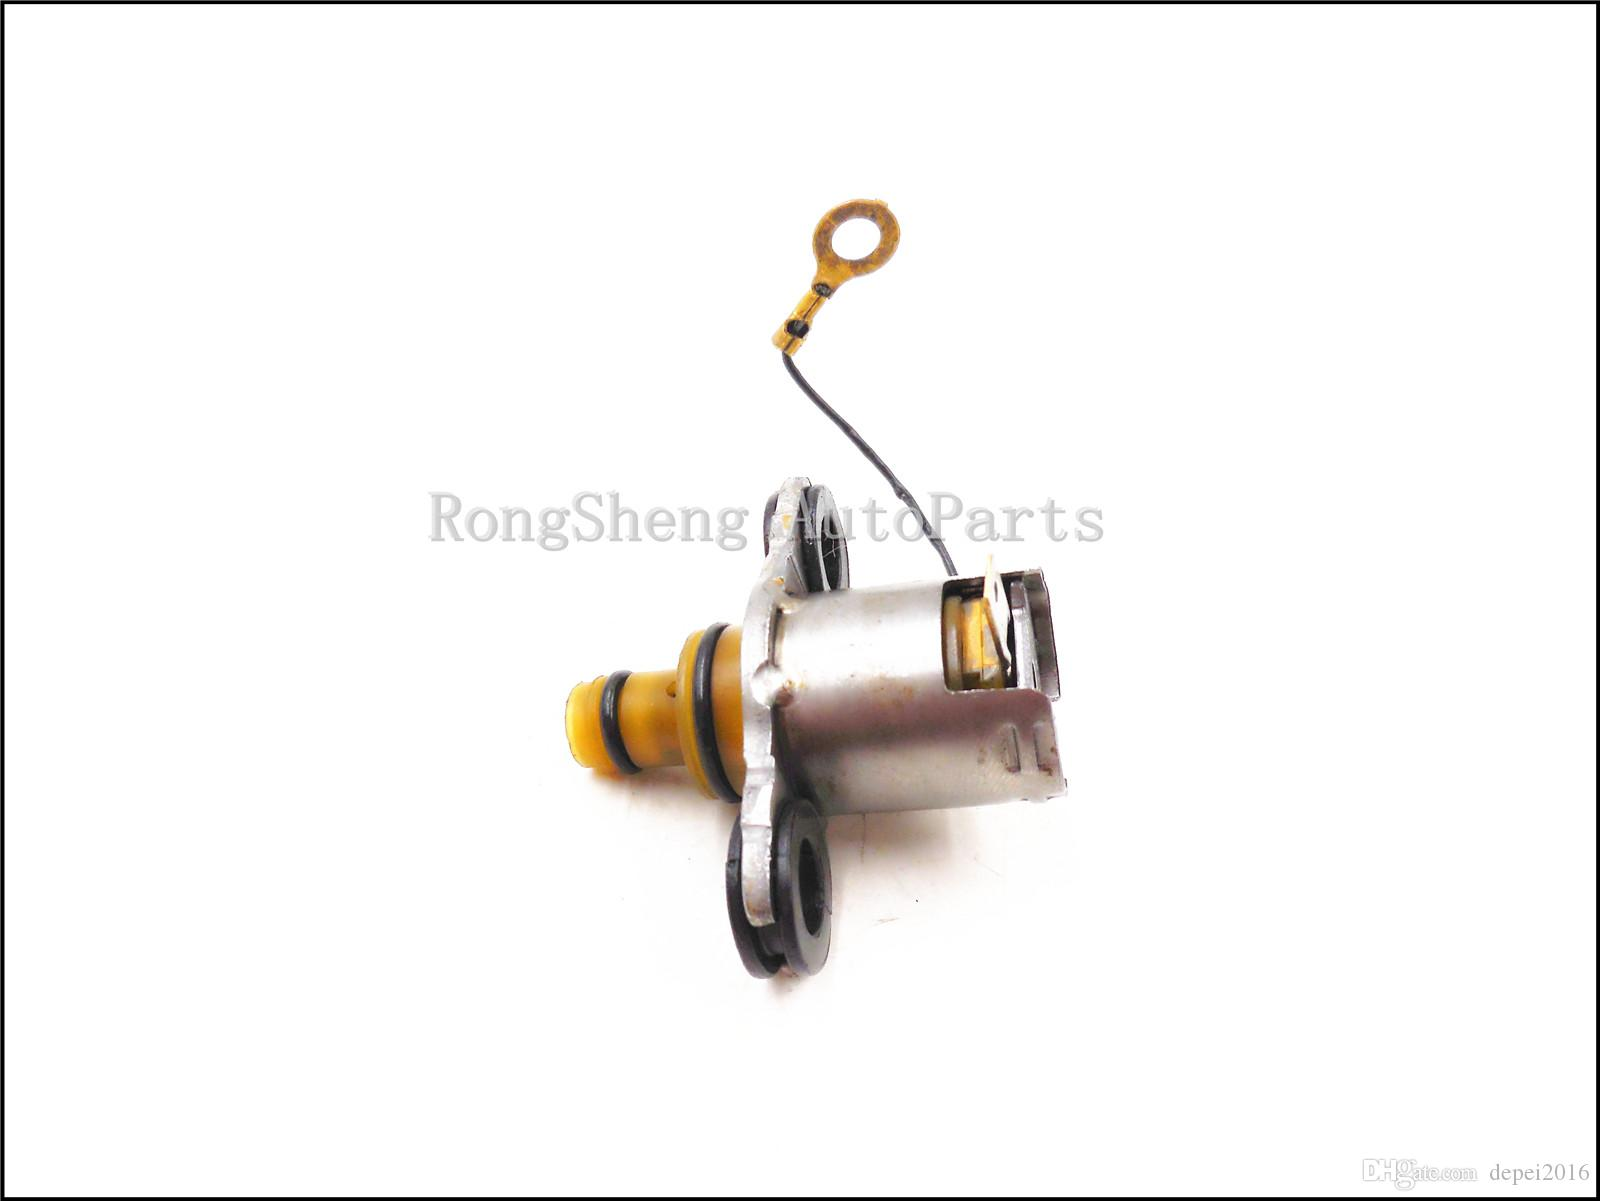 MITSUBISHI 변속기 용 솔레노이드 밸브 OEM G6T46175